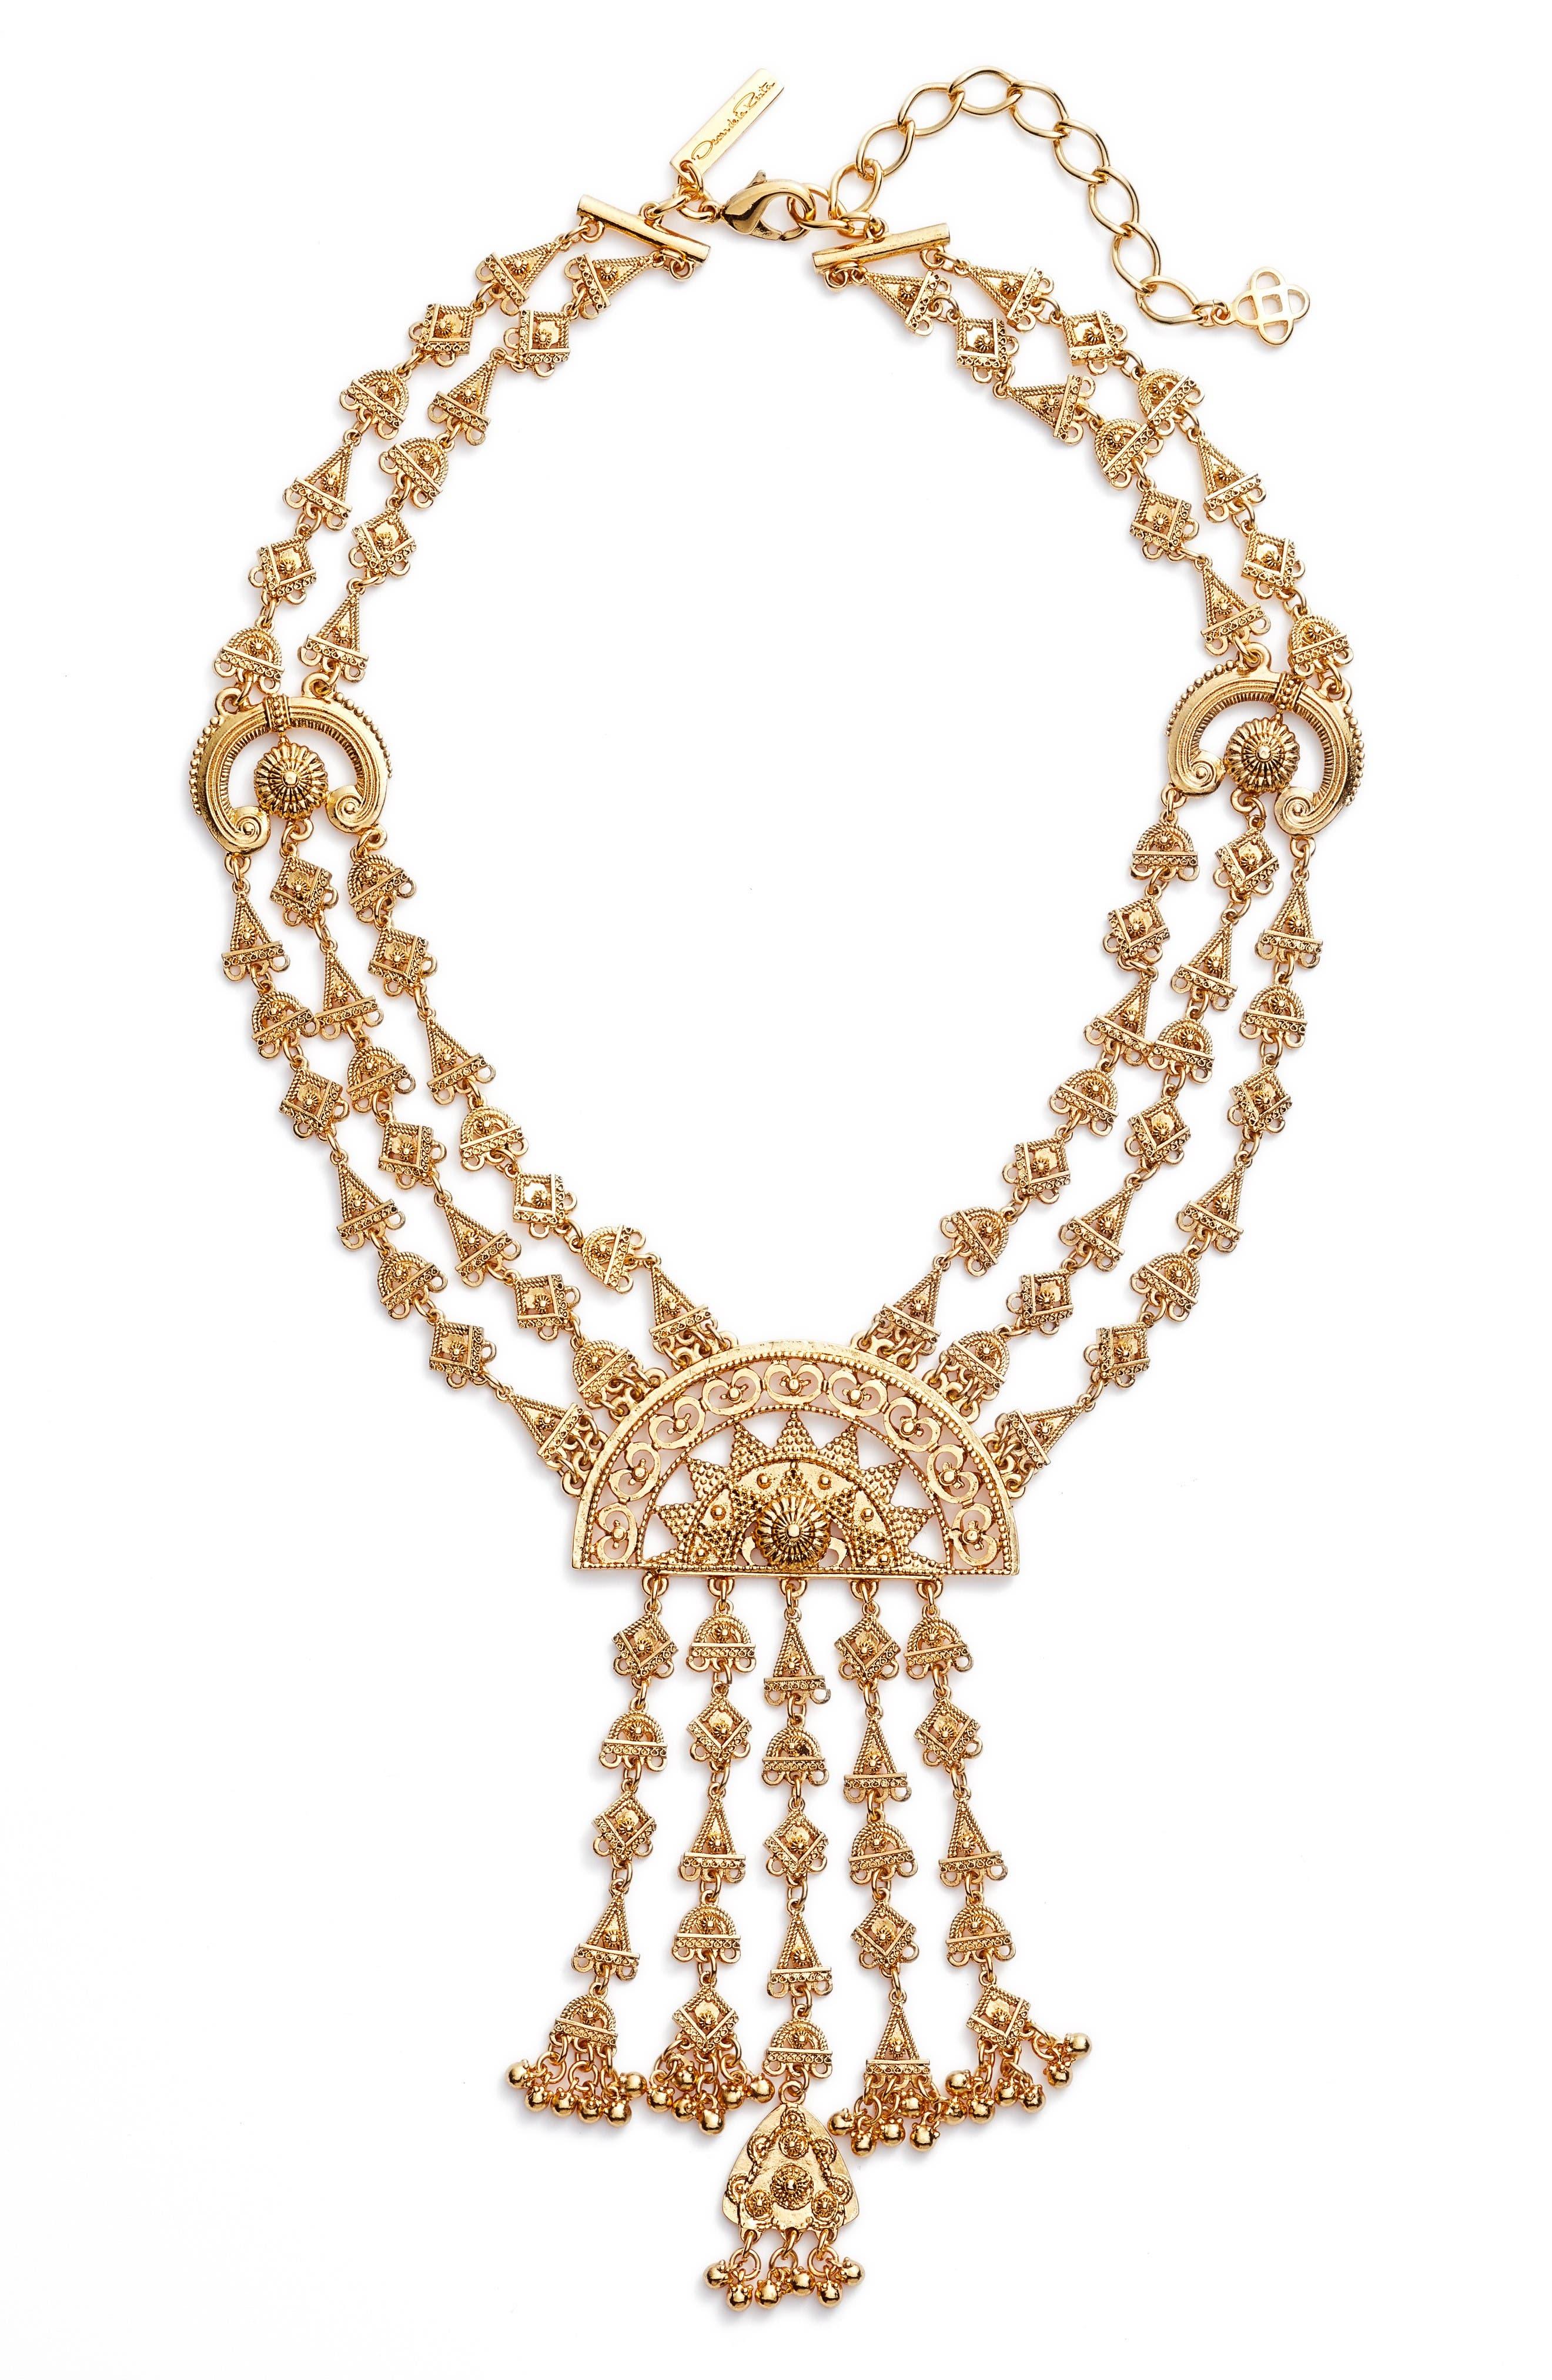 Main Image - Oscar de la Renta Ornate Charm Necklace